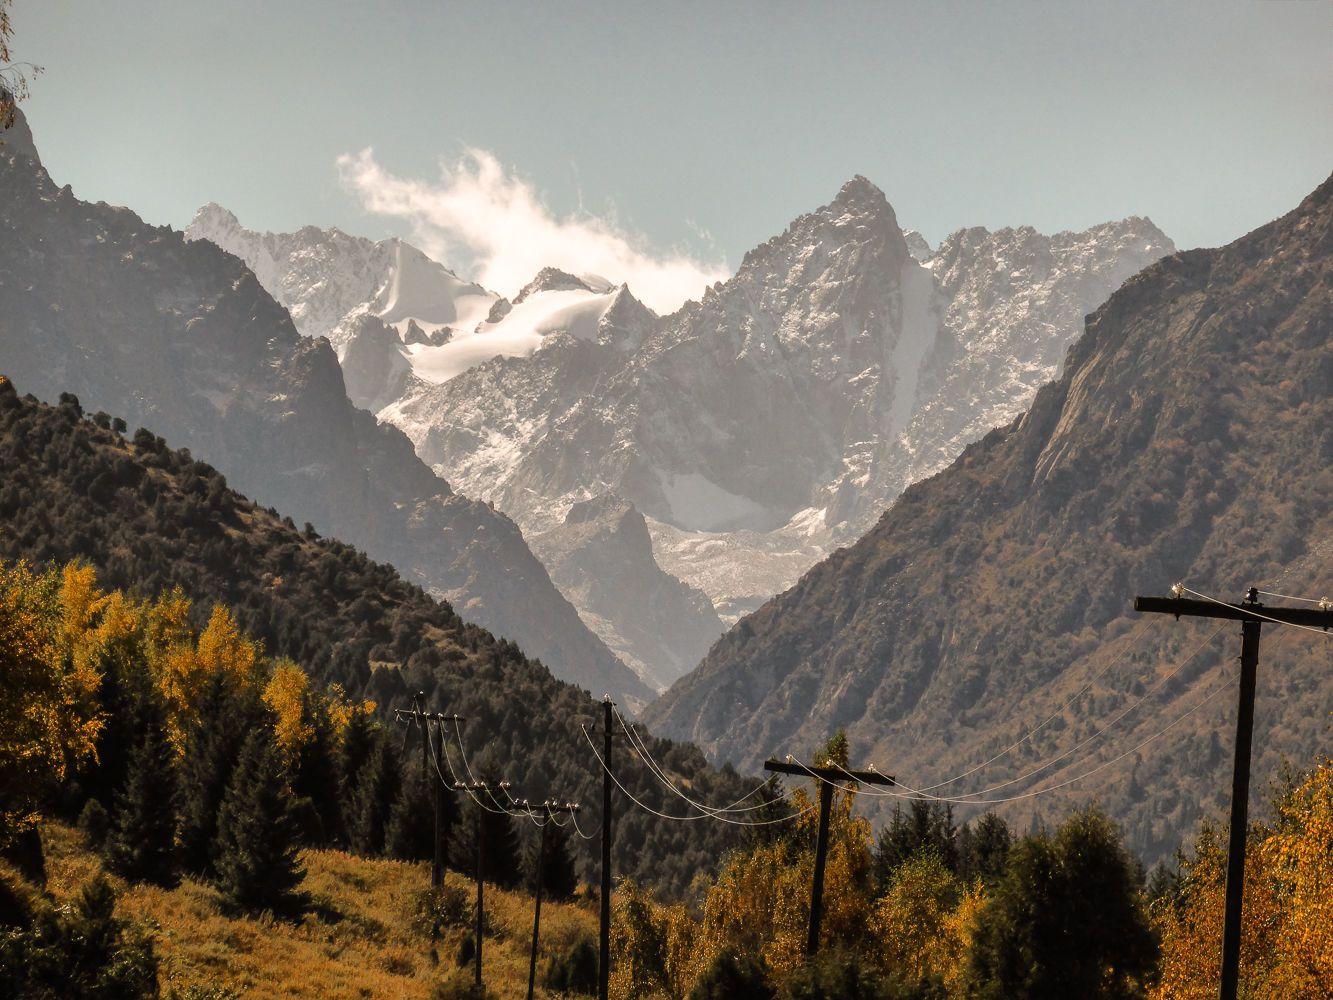 Central Asia Tour: Ala Archa National Park